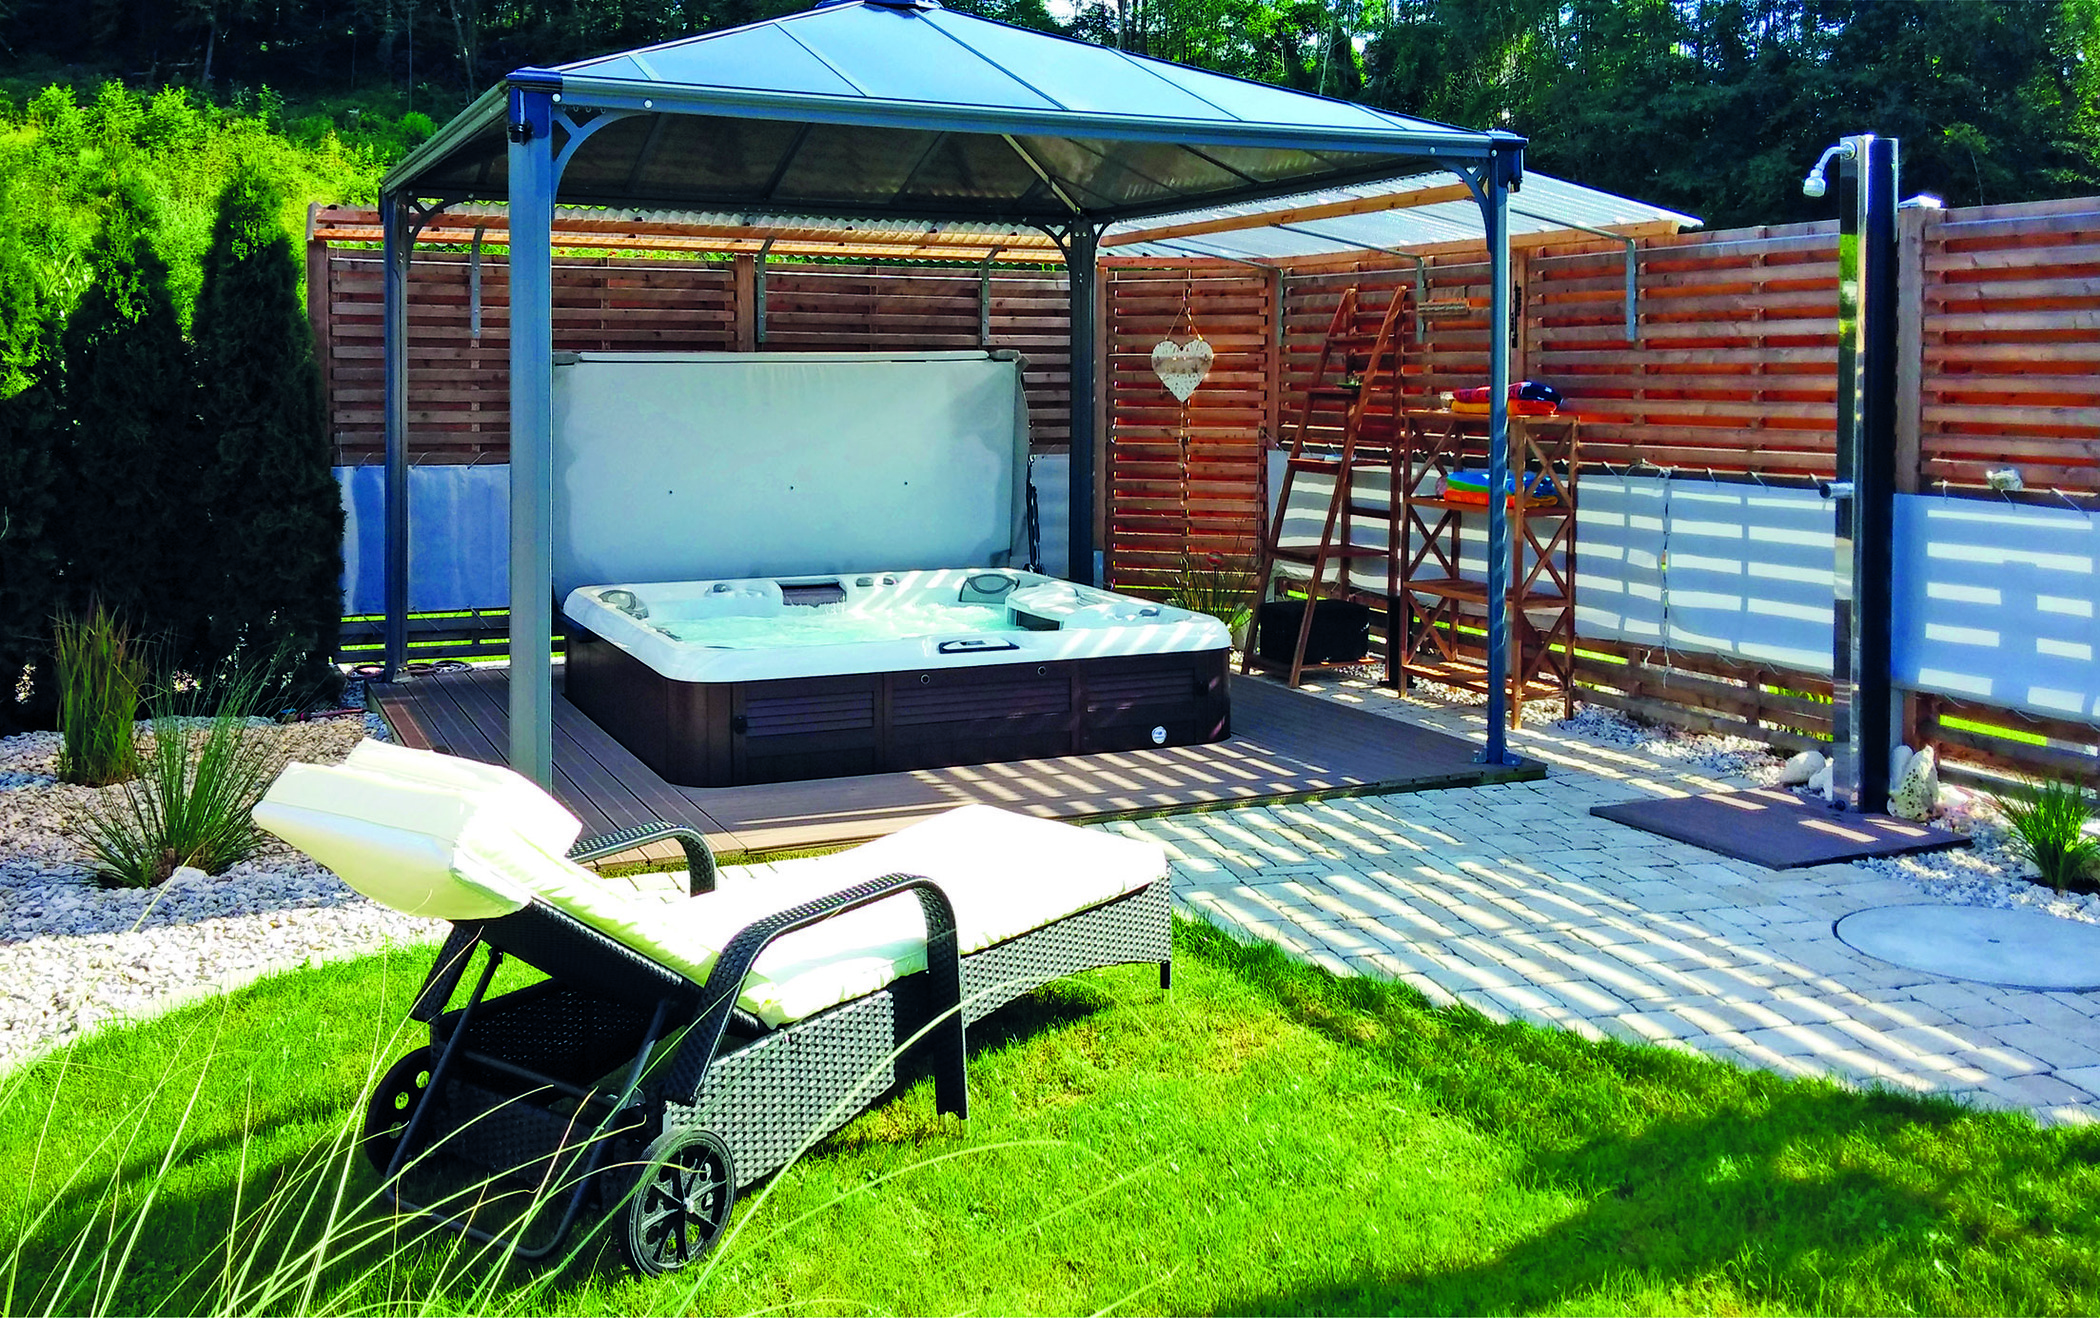 Gazebo and hot tub backyard installation.